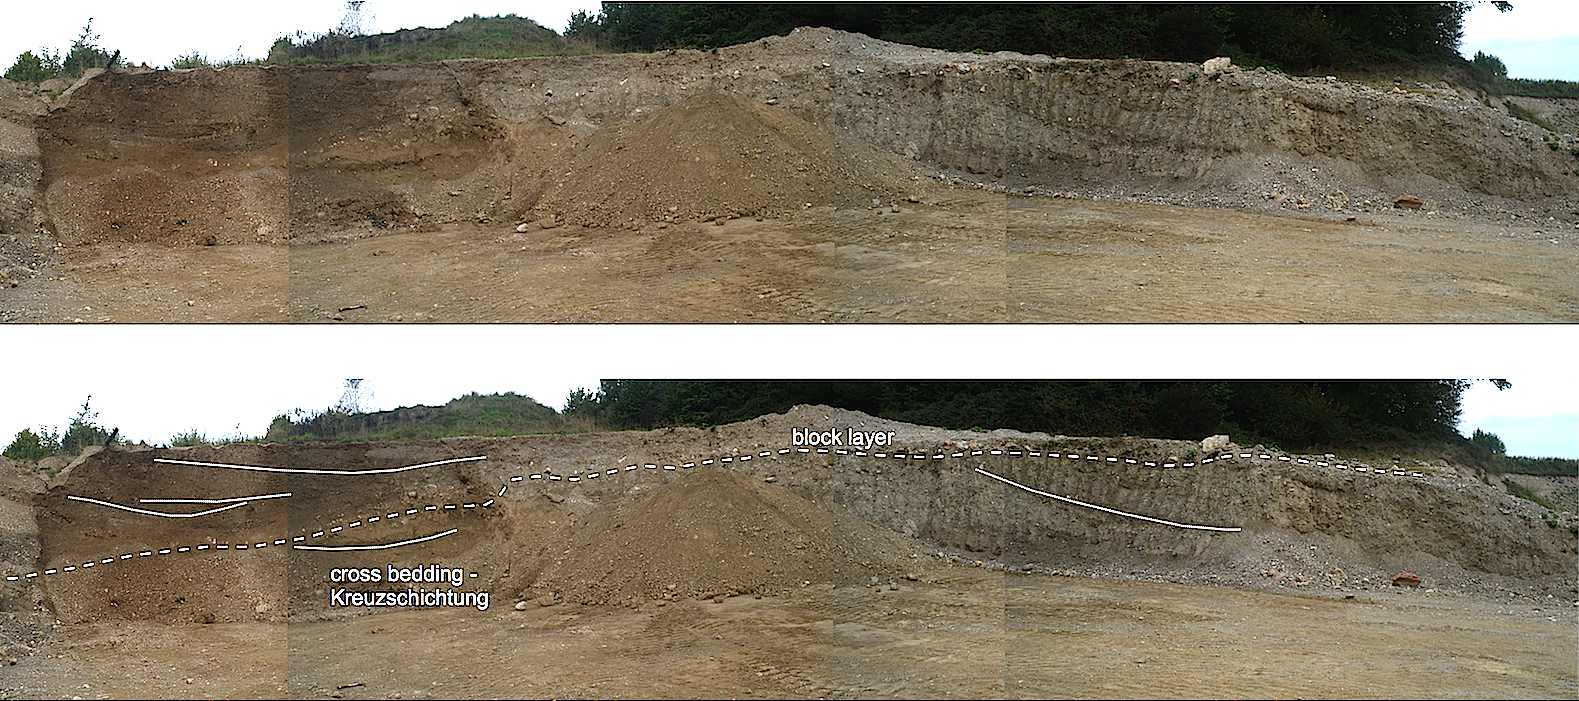 Lake Chiemsee meteorite impact tsunami deposit - cross-bedded diamictite